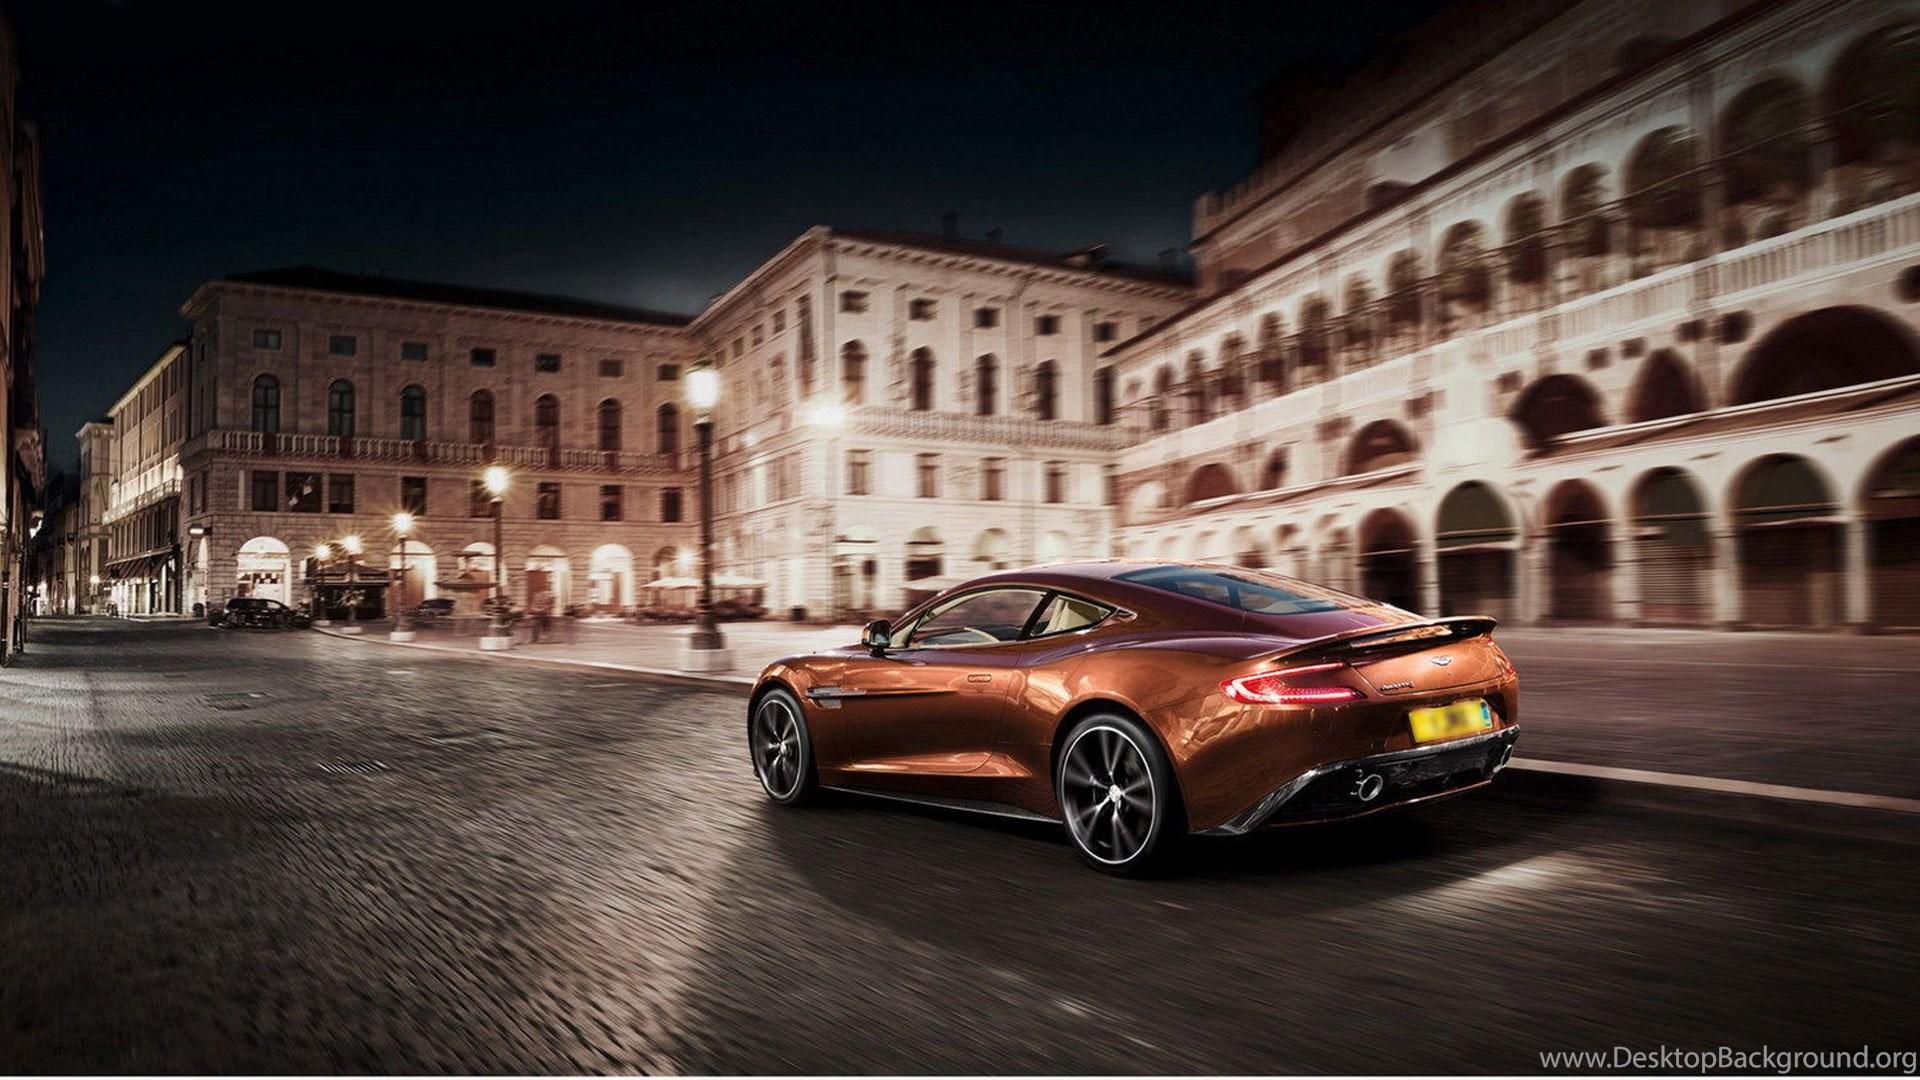 Aston Martin Vanquish Wallpaper Desktop Background